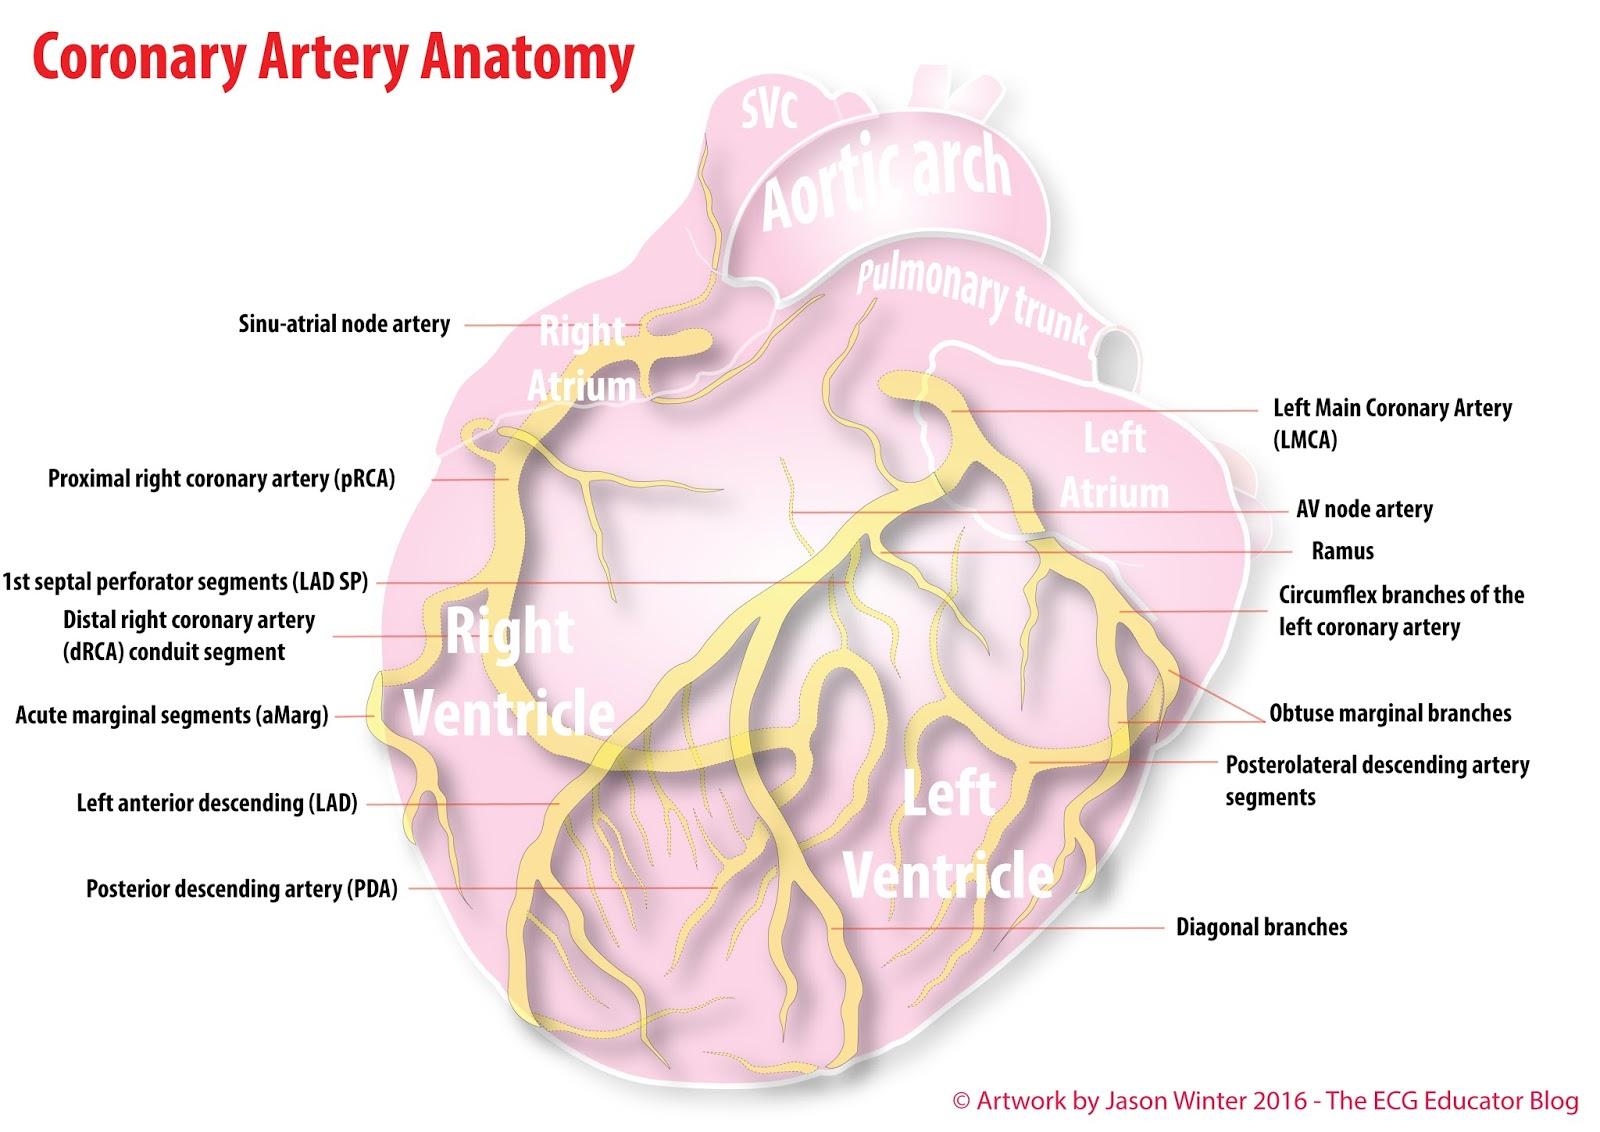 hight resolution of coronary artery anatomy medstudent anatomy coronary artery anatomy circumflex